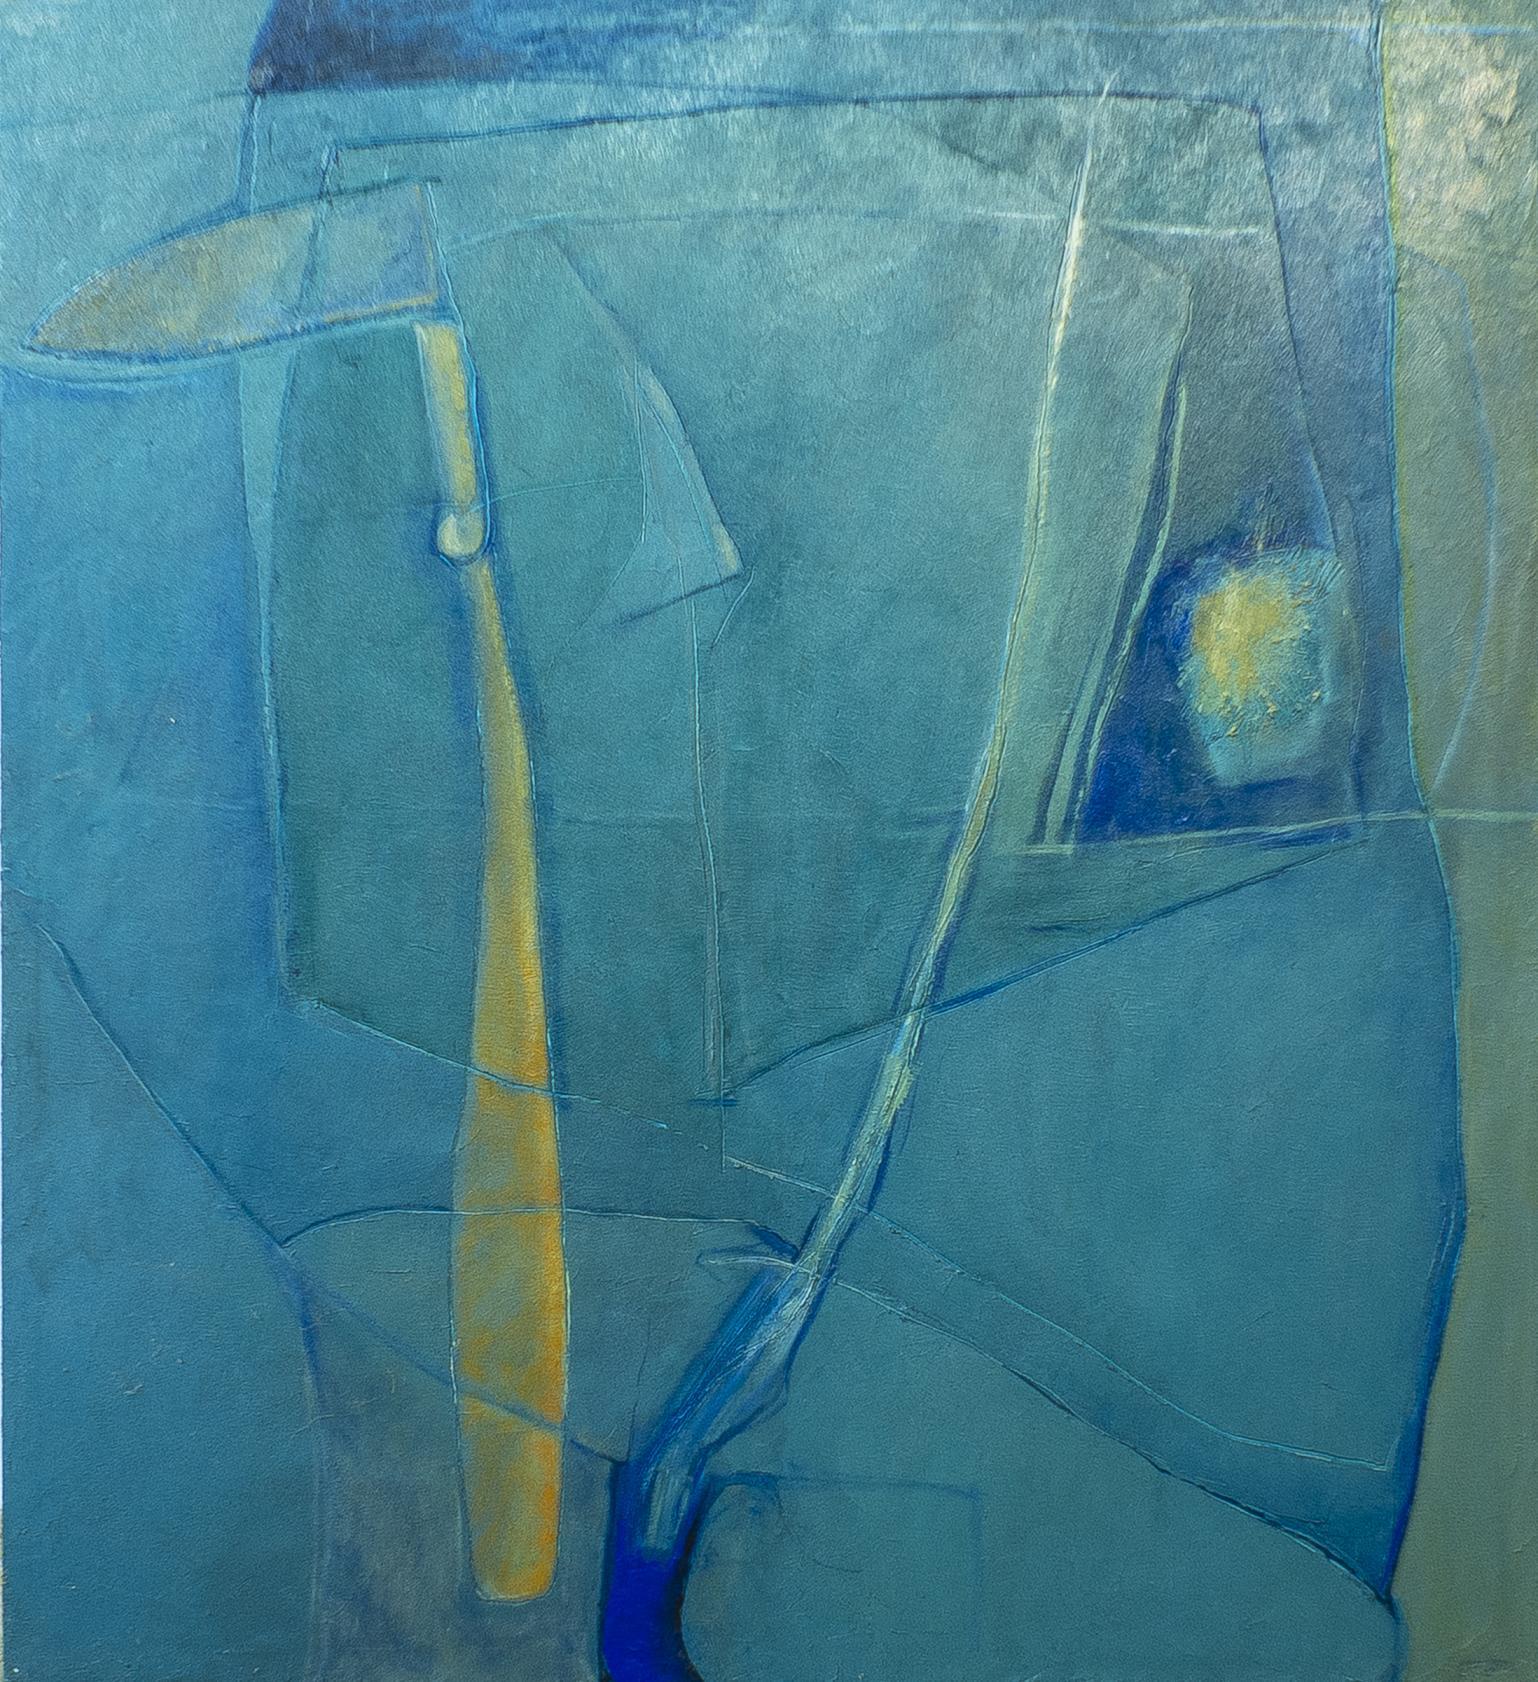 Mar (2014) - Pedro Carrasco